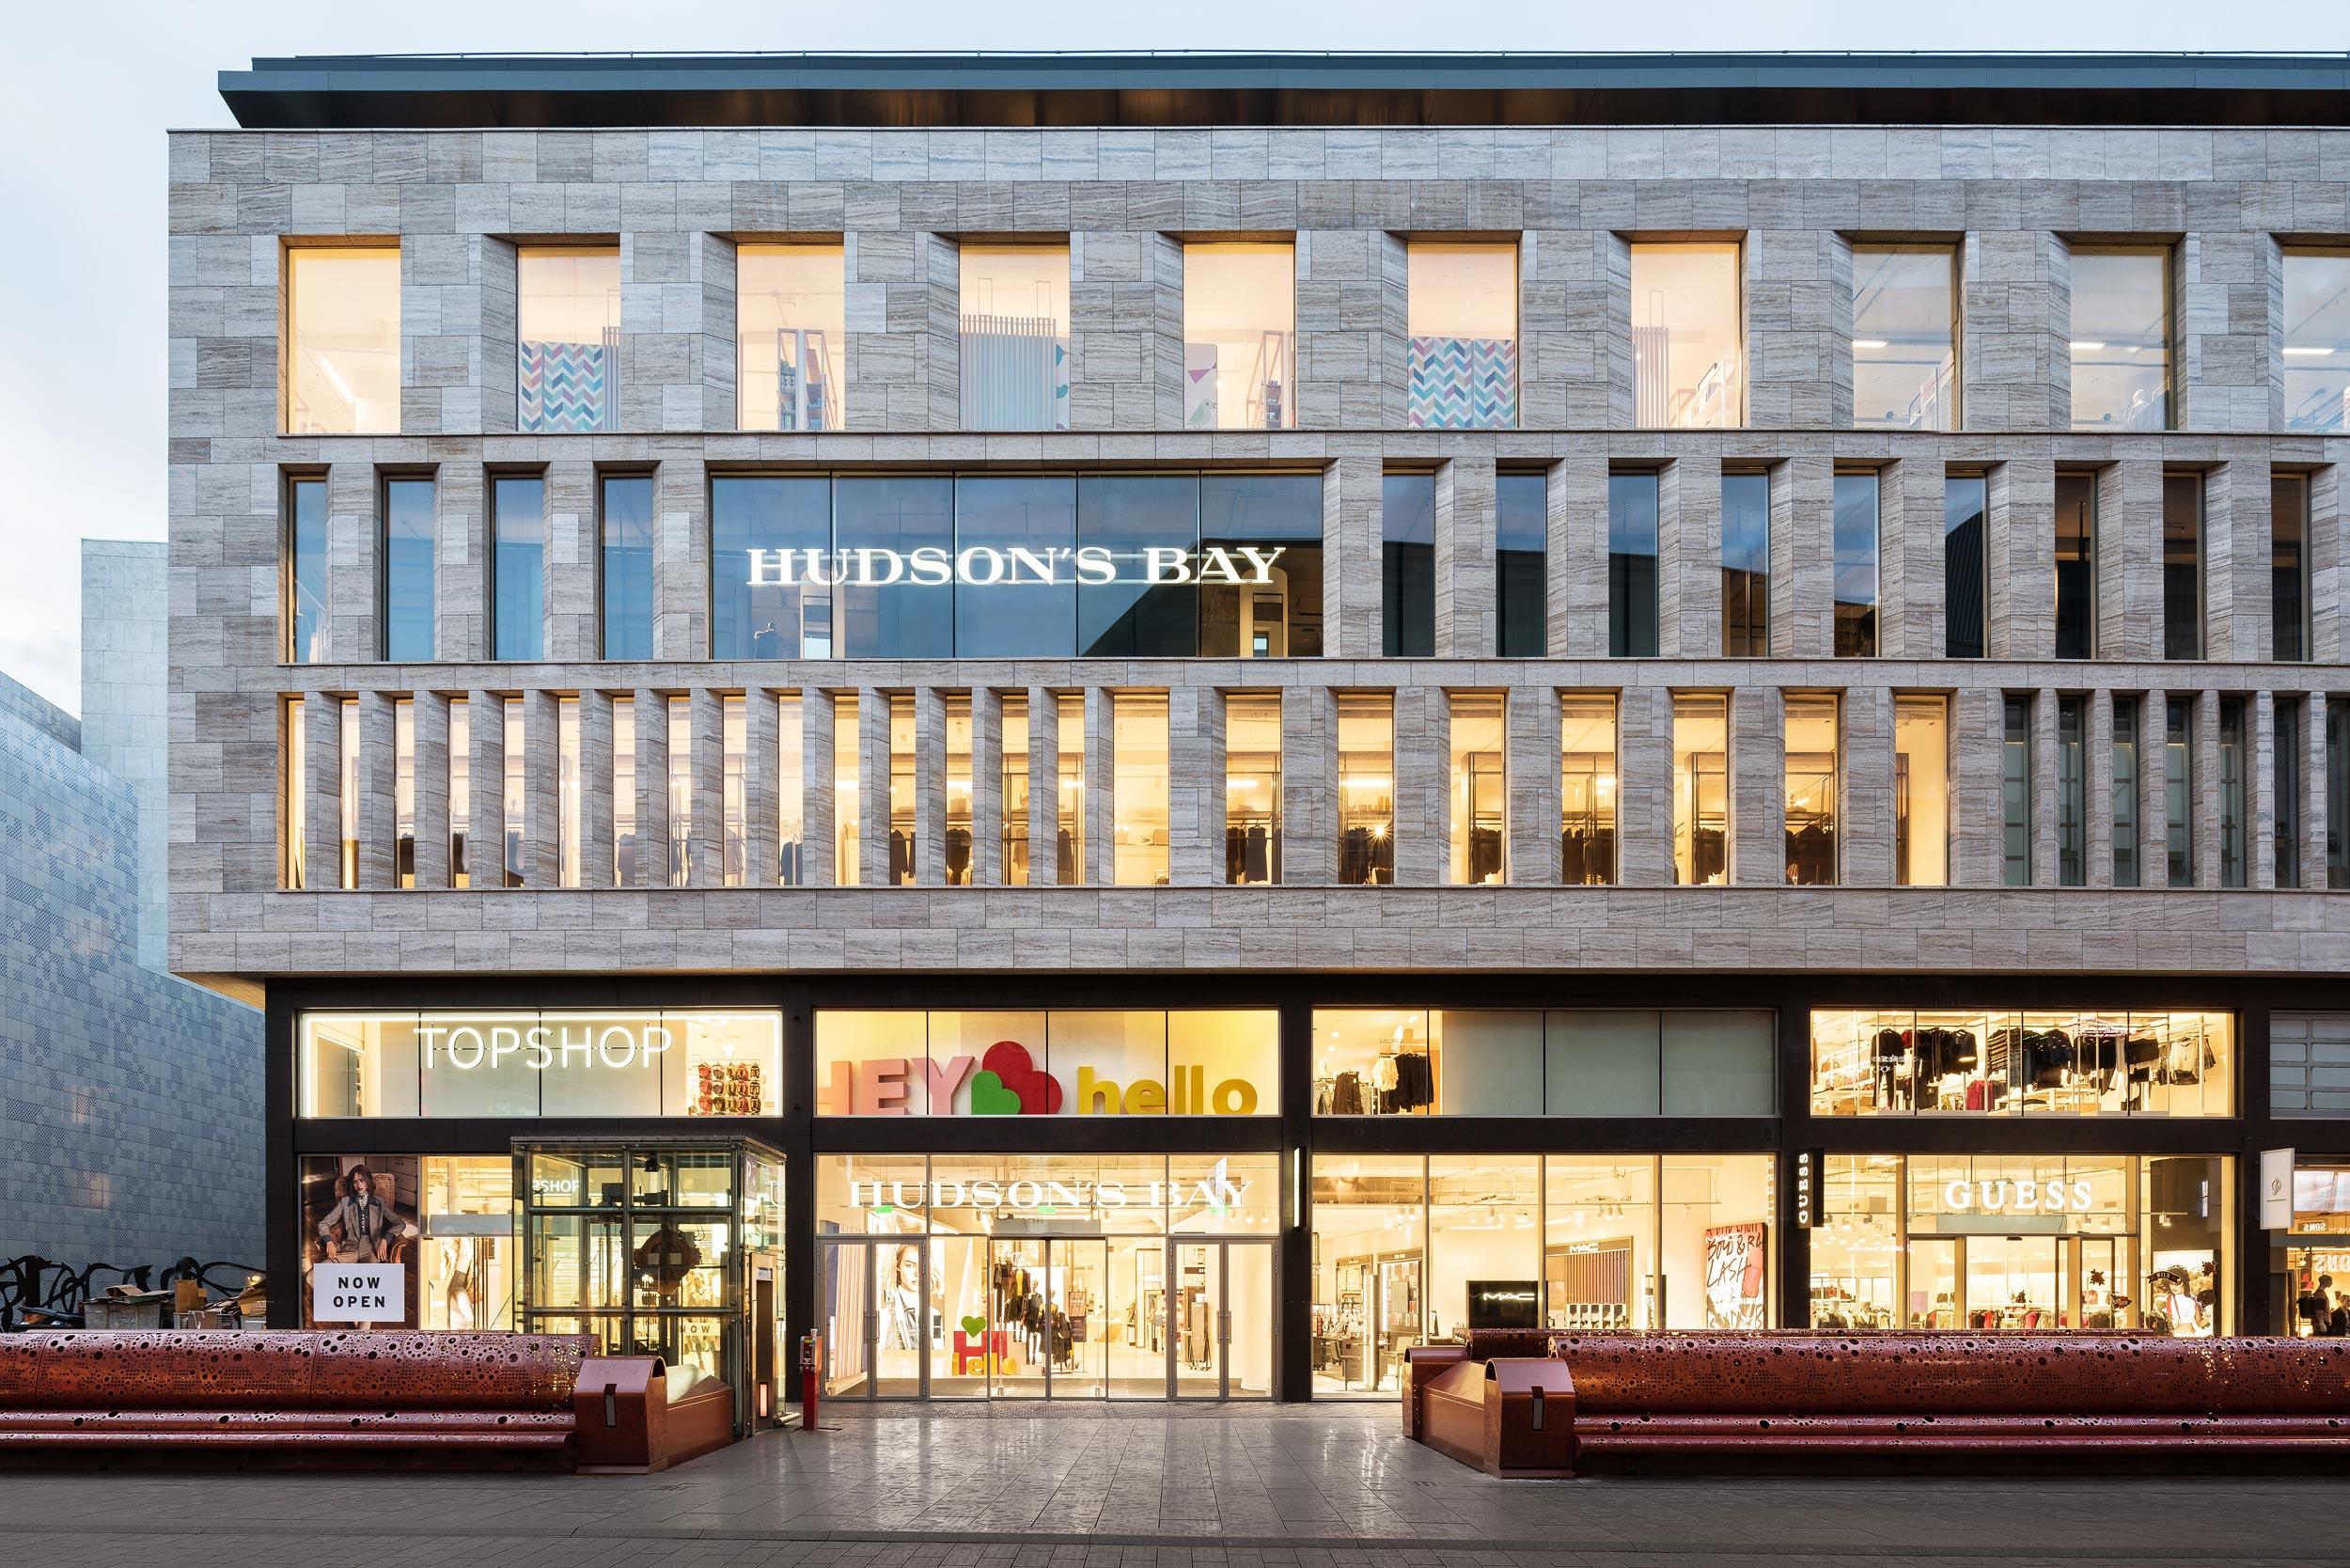 Hudson's Bay - Den Haag - architectuurfotograaf Chiel de Nooyer